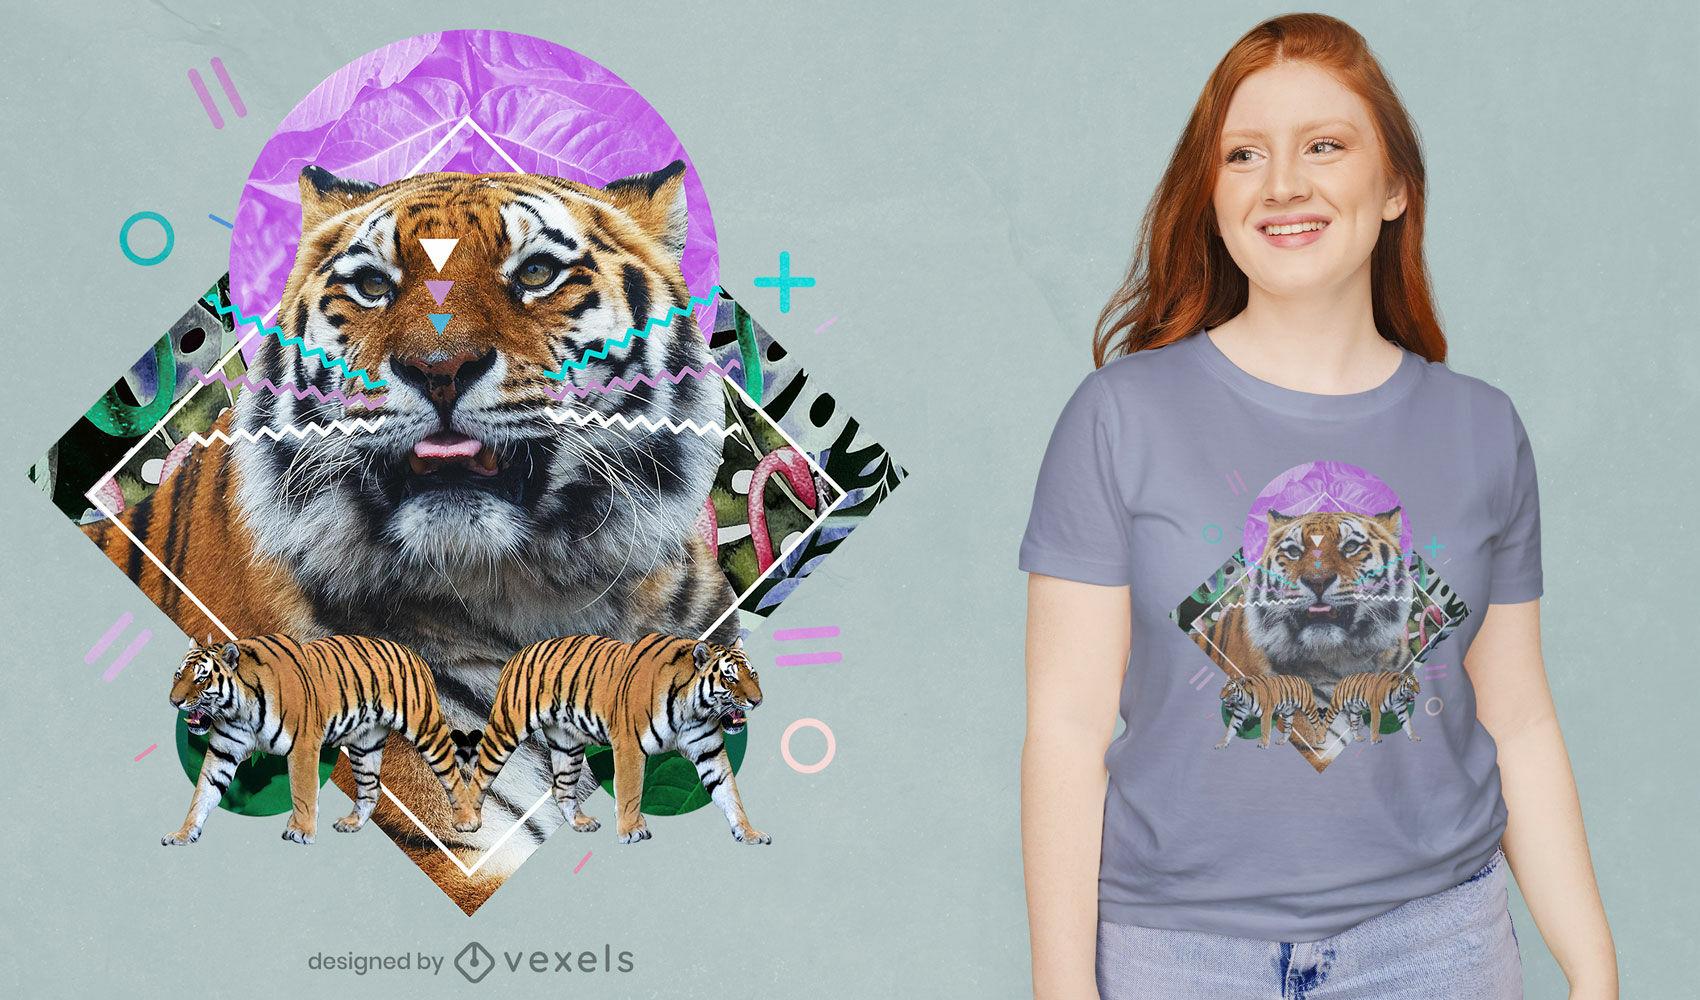 Tiger wild animal collage t-shirt psd